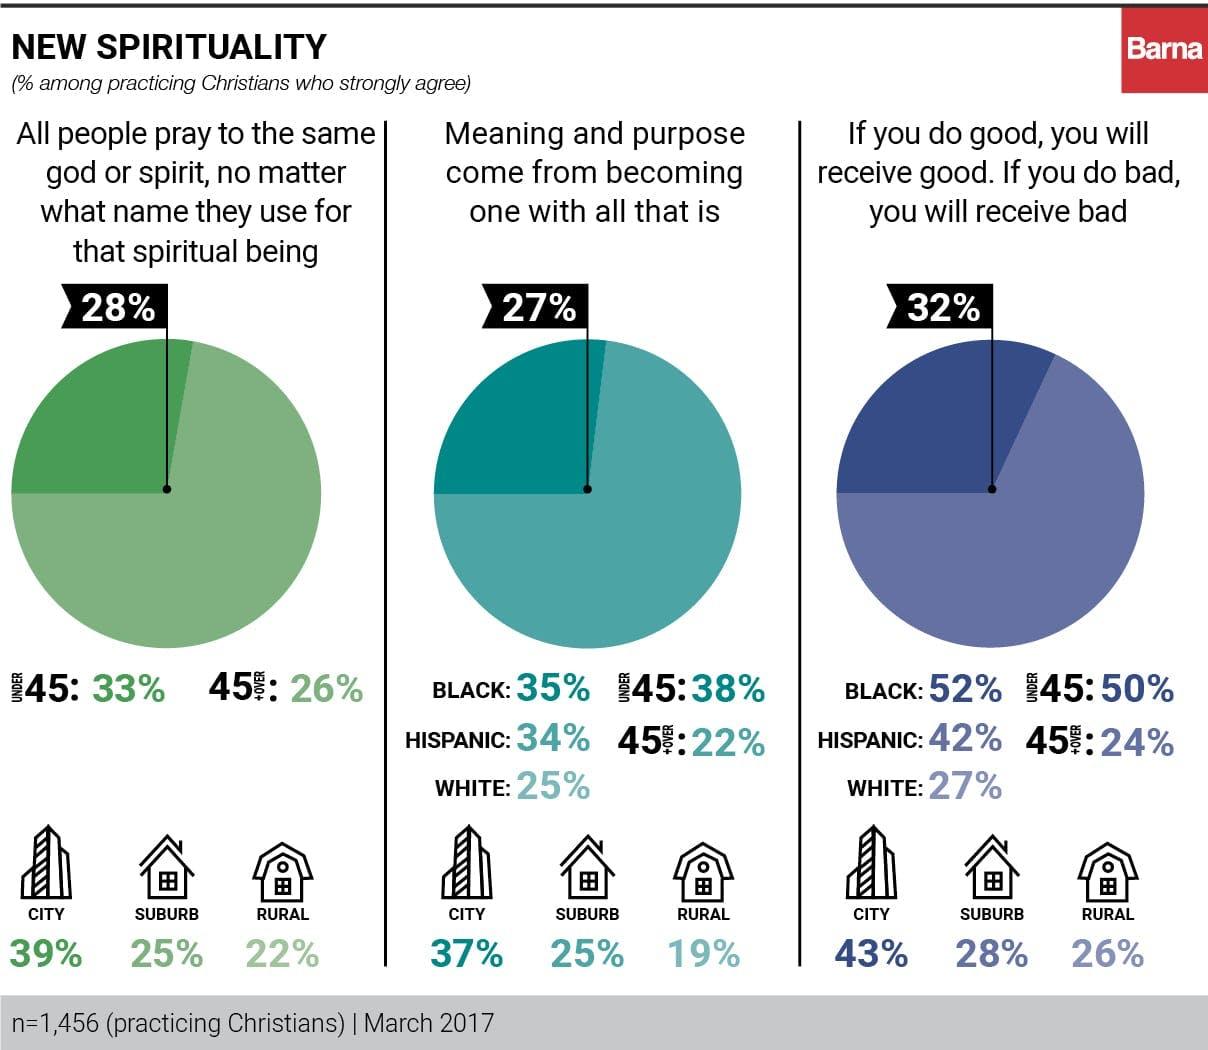 New spirituality